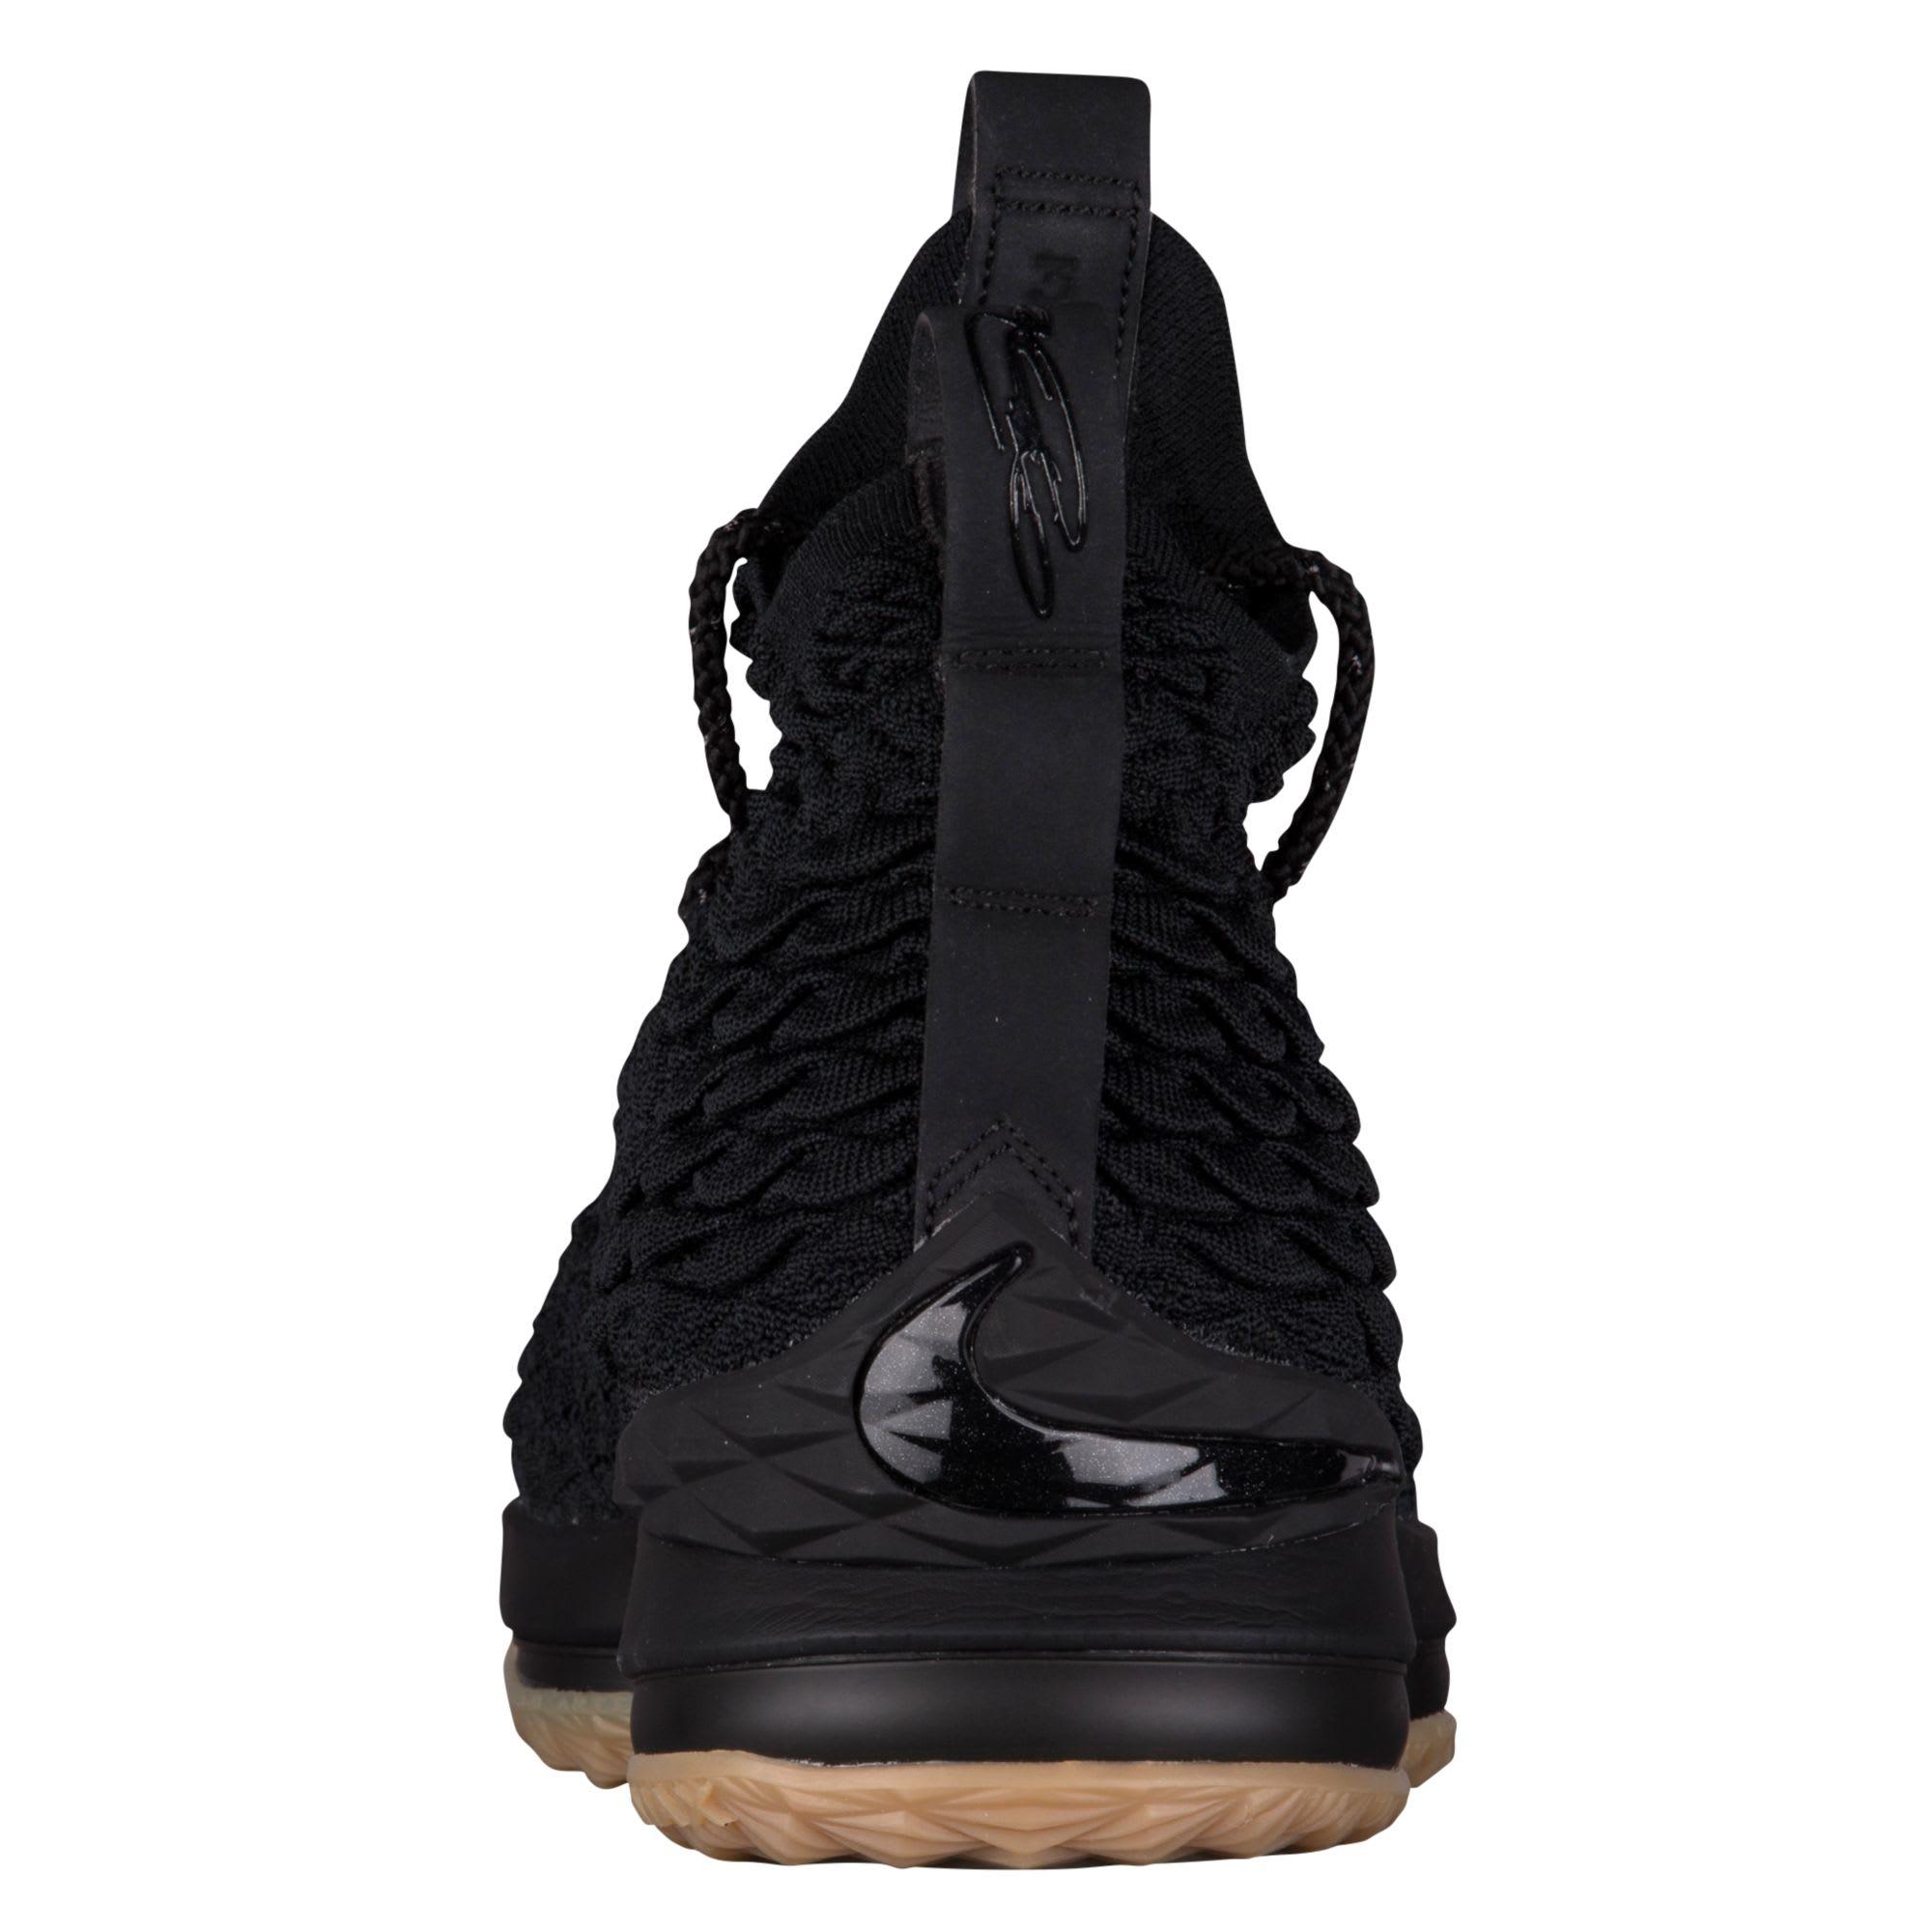 709005fefe7f Nike LeBron 15 Black Gum Release Date 897648-300 Heel